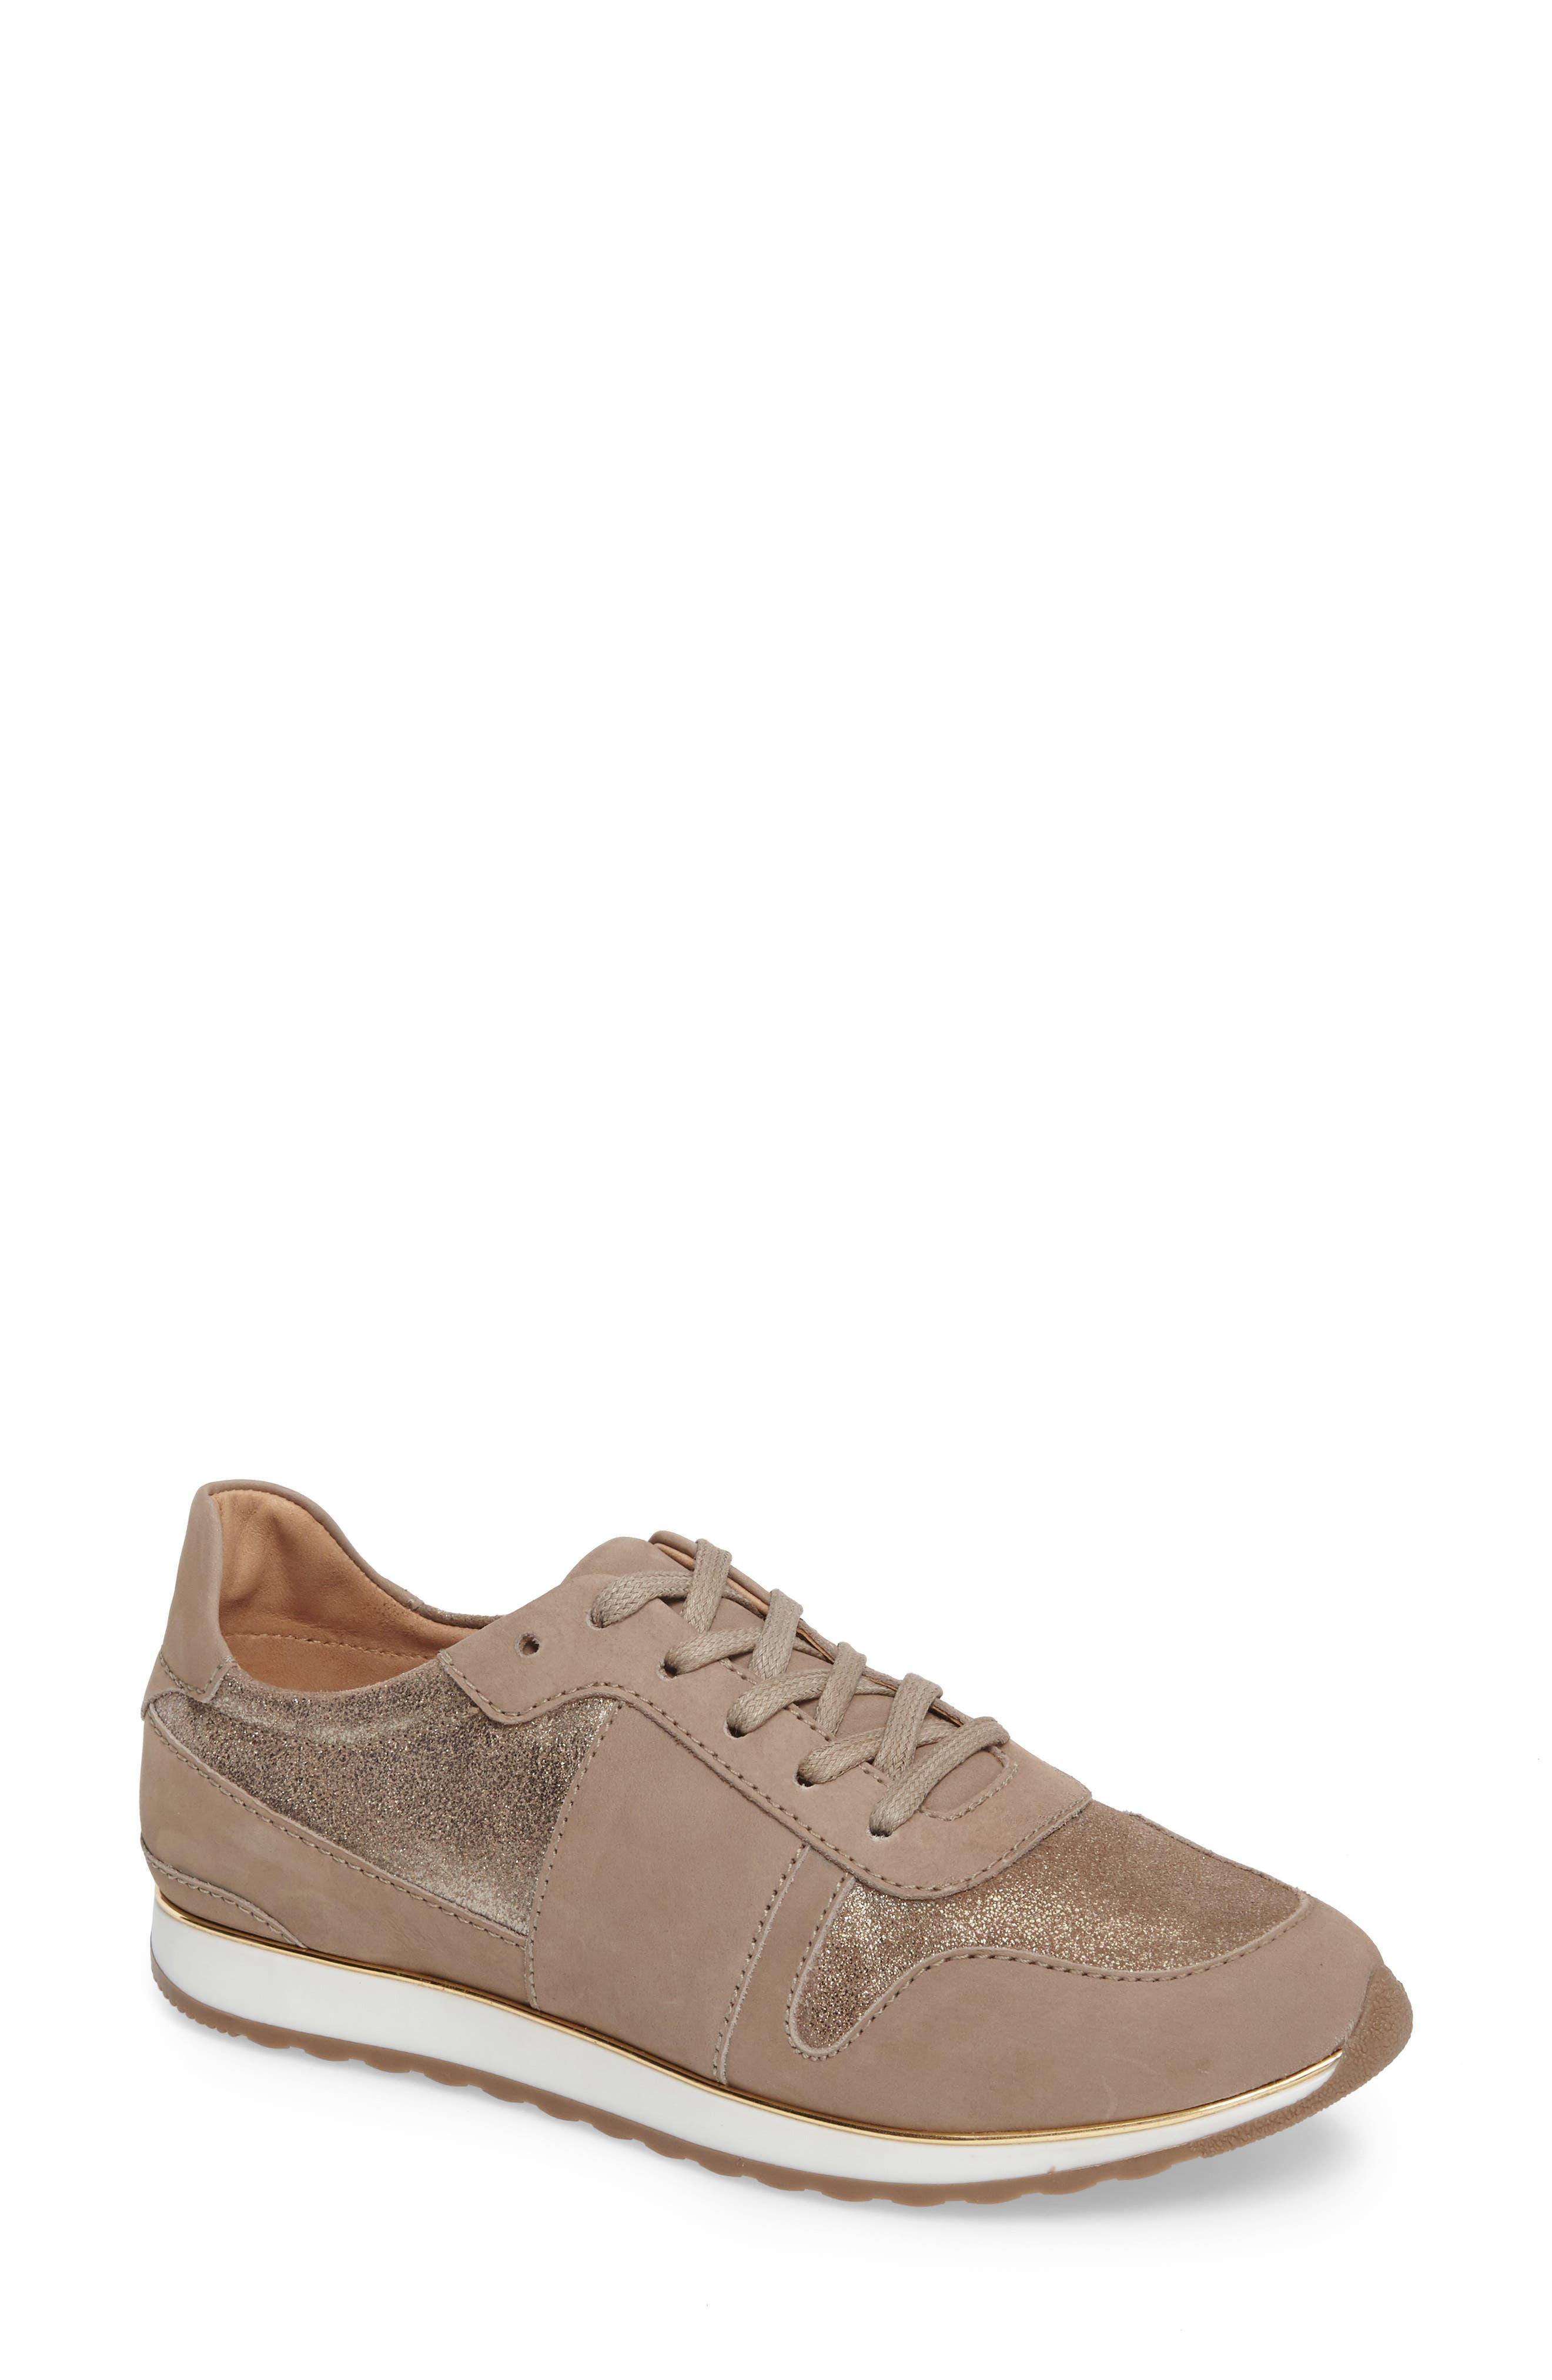 KLUB NICO,                             Stefani Sneaker,                             Main thumbnail 1, color,                             030